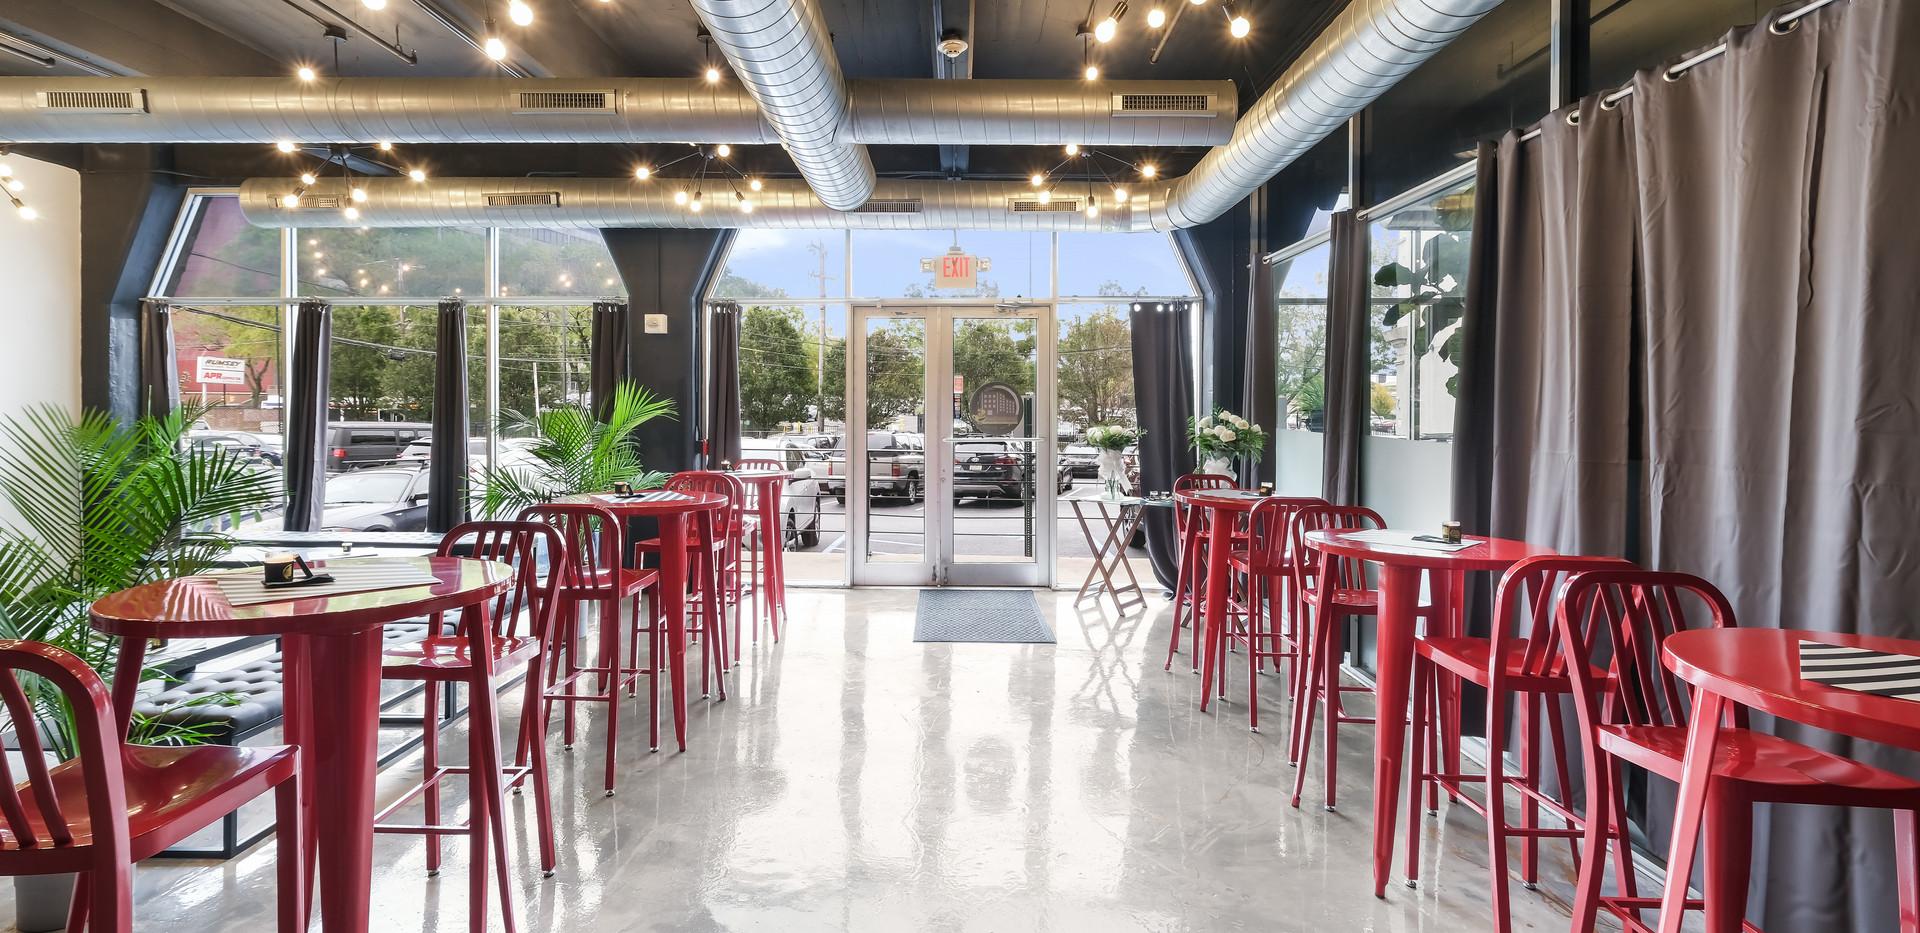 Café Seating